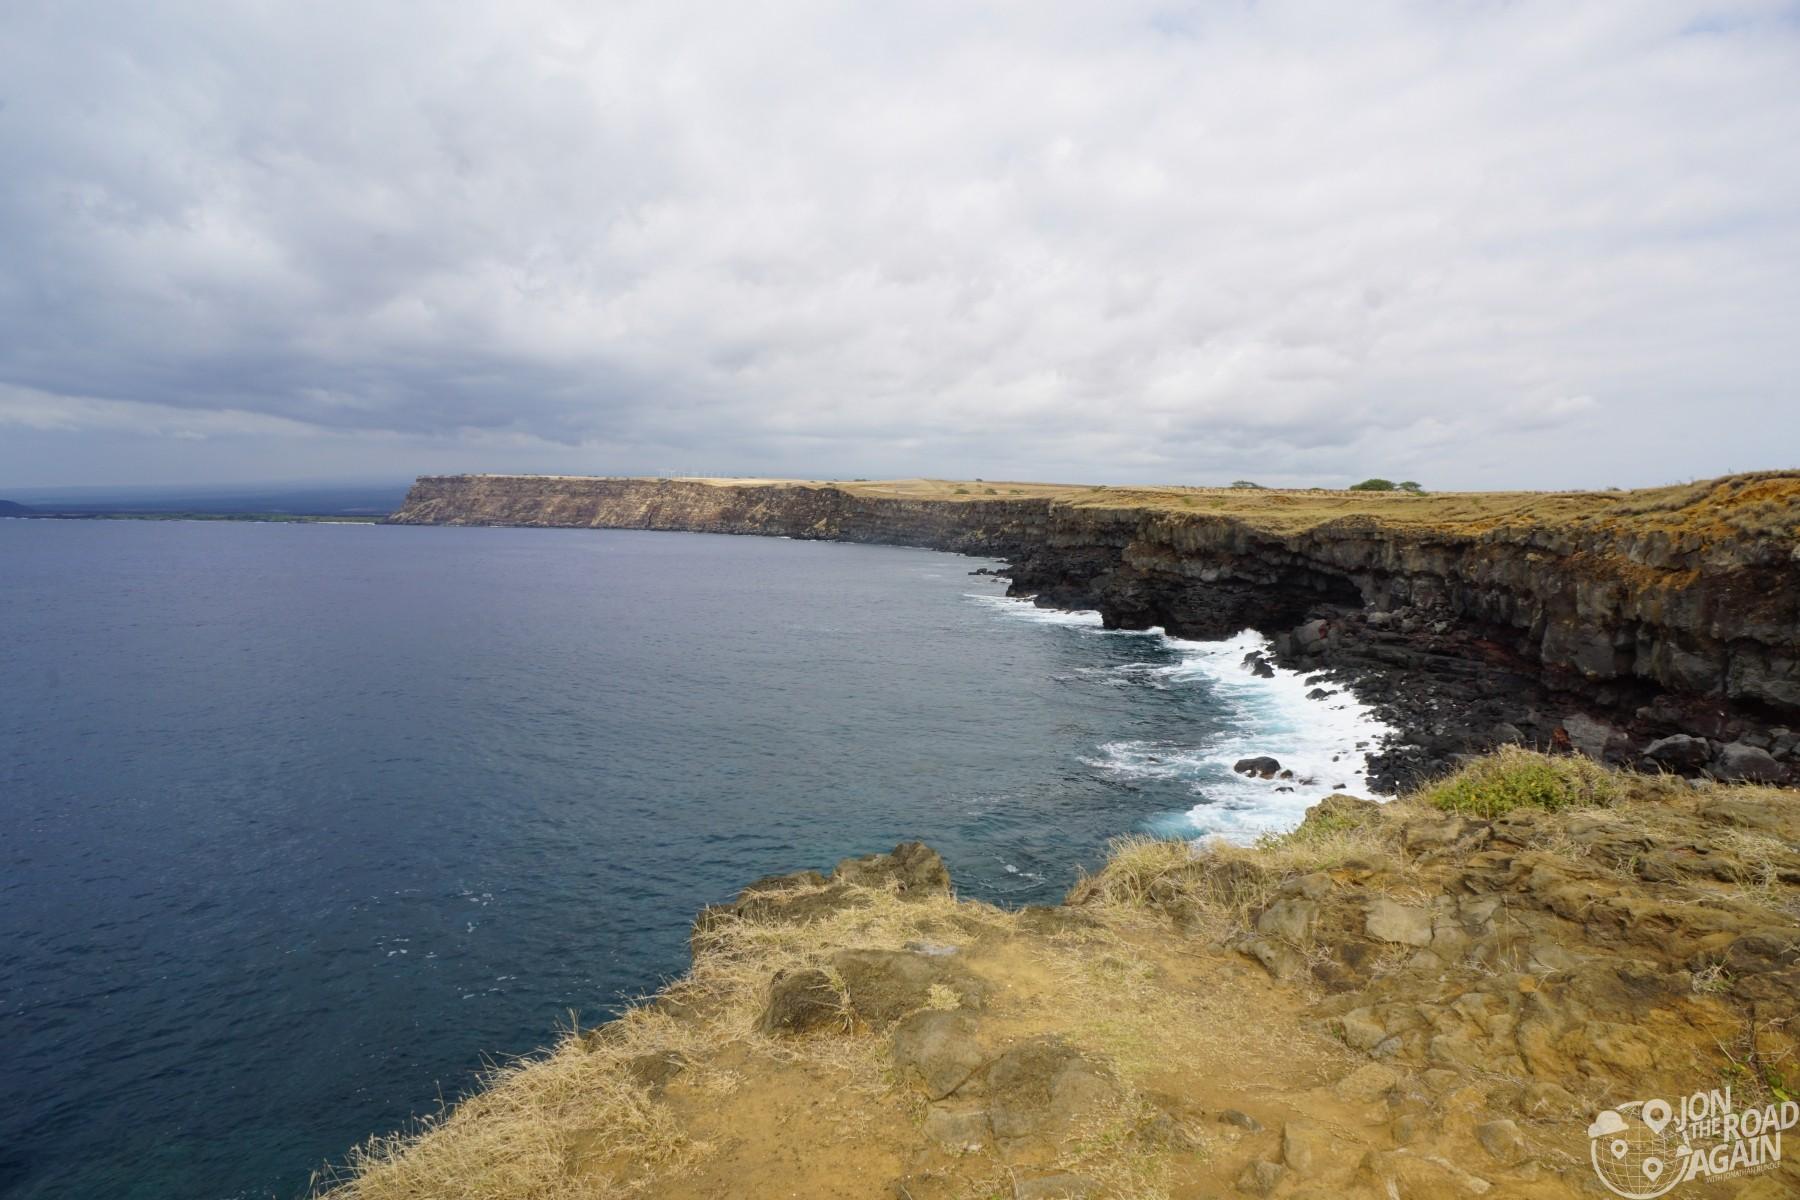 South point coast view Hawaii